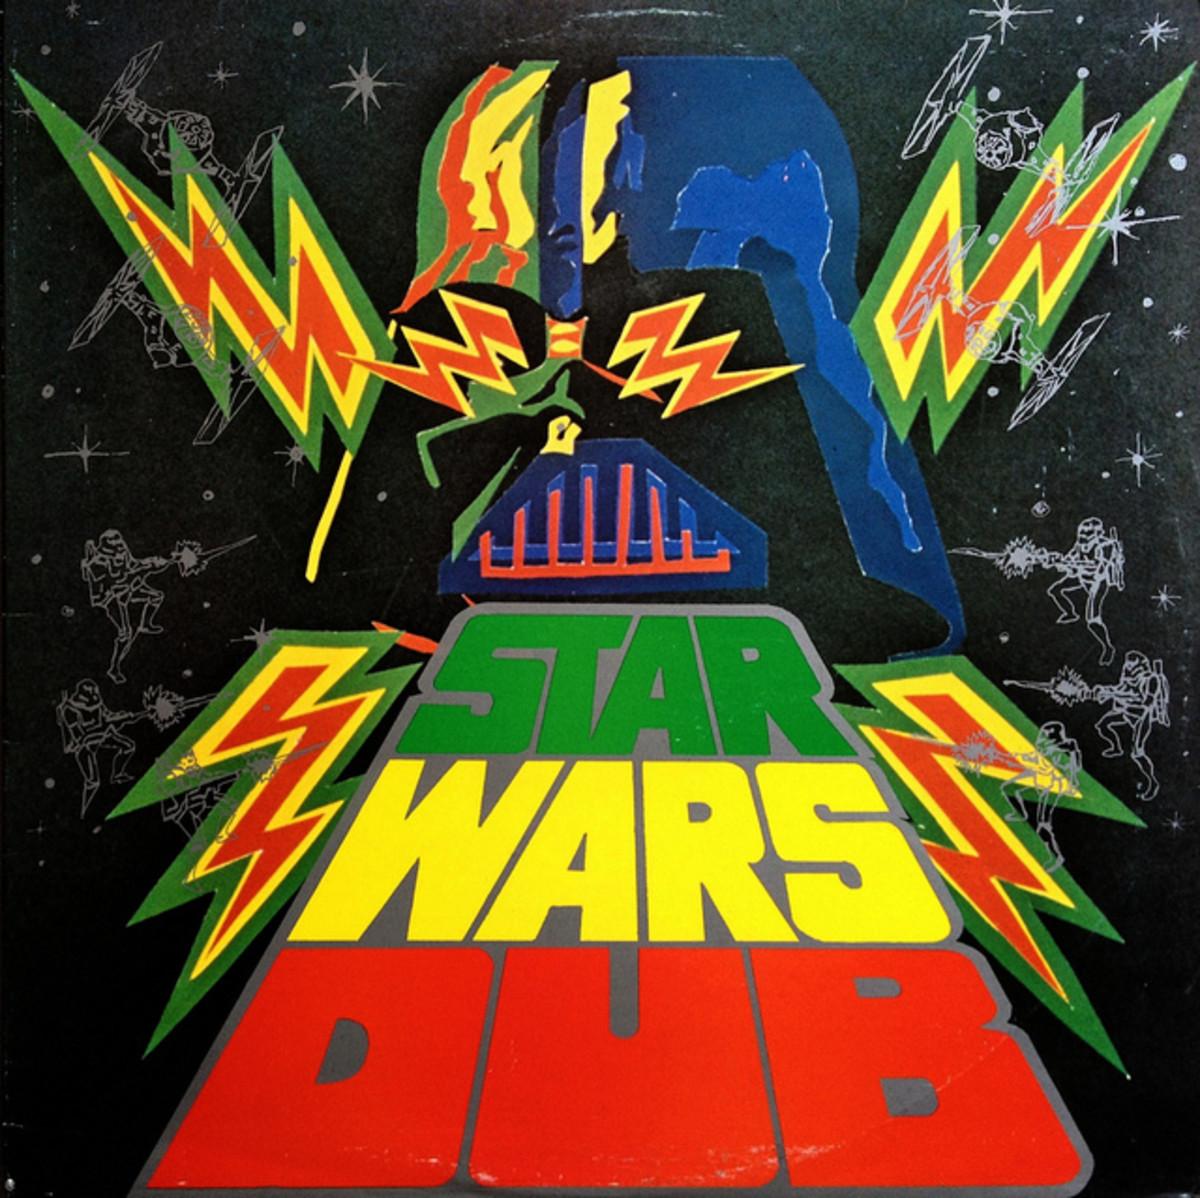 "Phil Pratt & The Sunshot Band  ""Star Wars Dub"" Burning Sounds BS 1019 12"" LP Vinyl Record, UK Pressing (!978) Blue Vinyl"